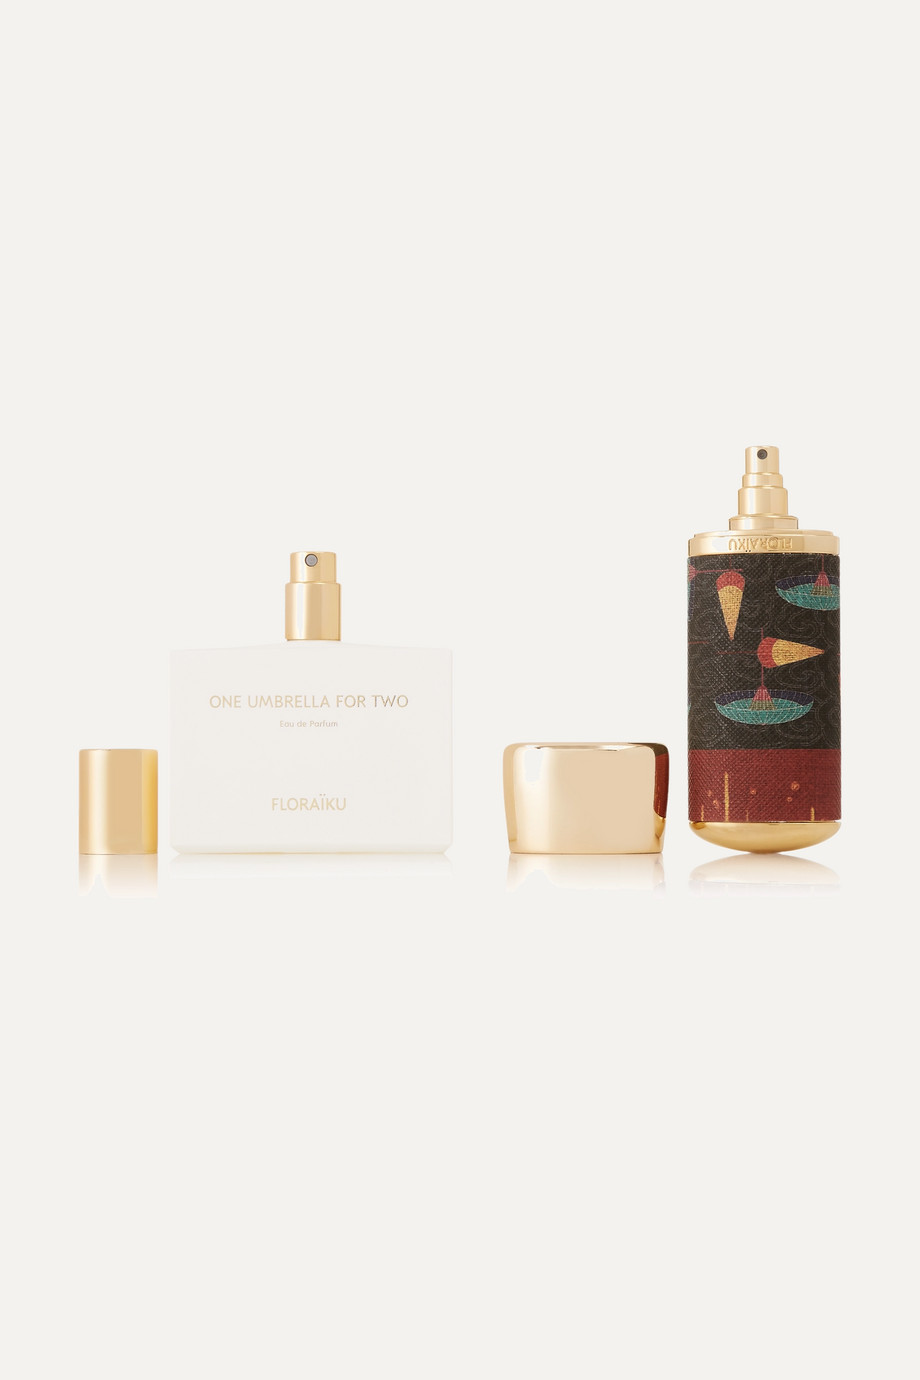 Floraiku One Umbrella For Two, 50 ml & 10 ml – Eau de Parfum